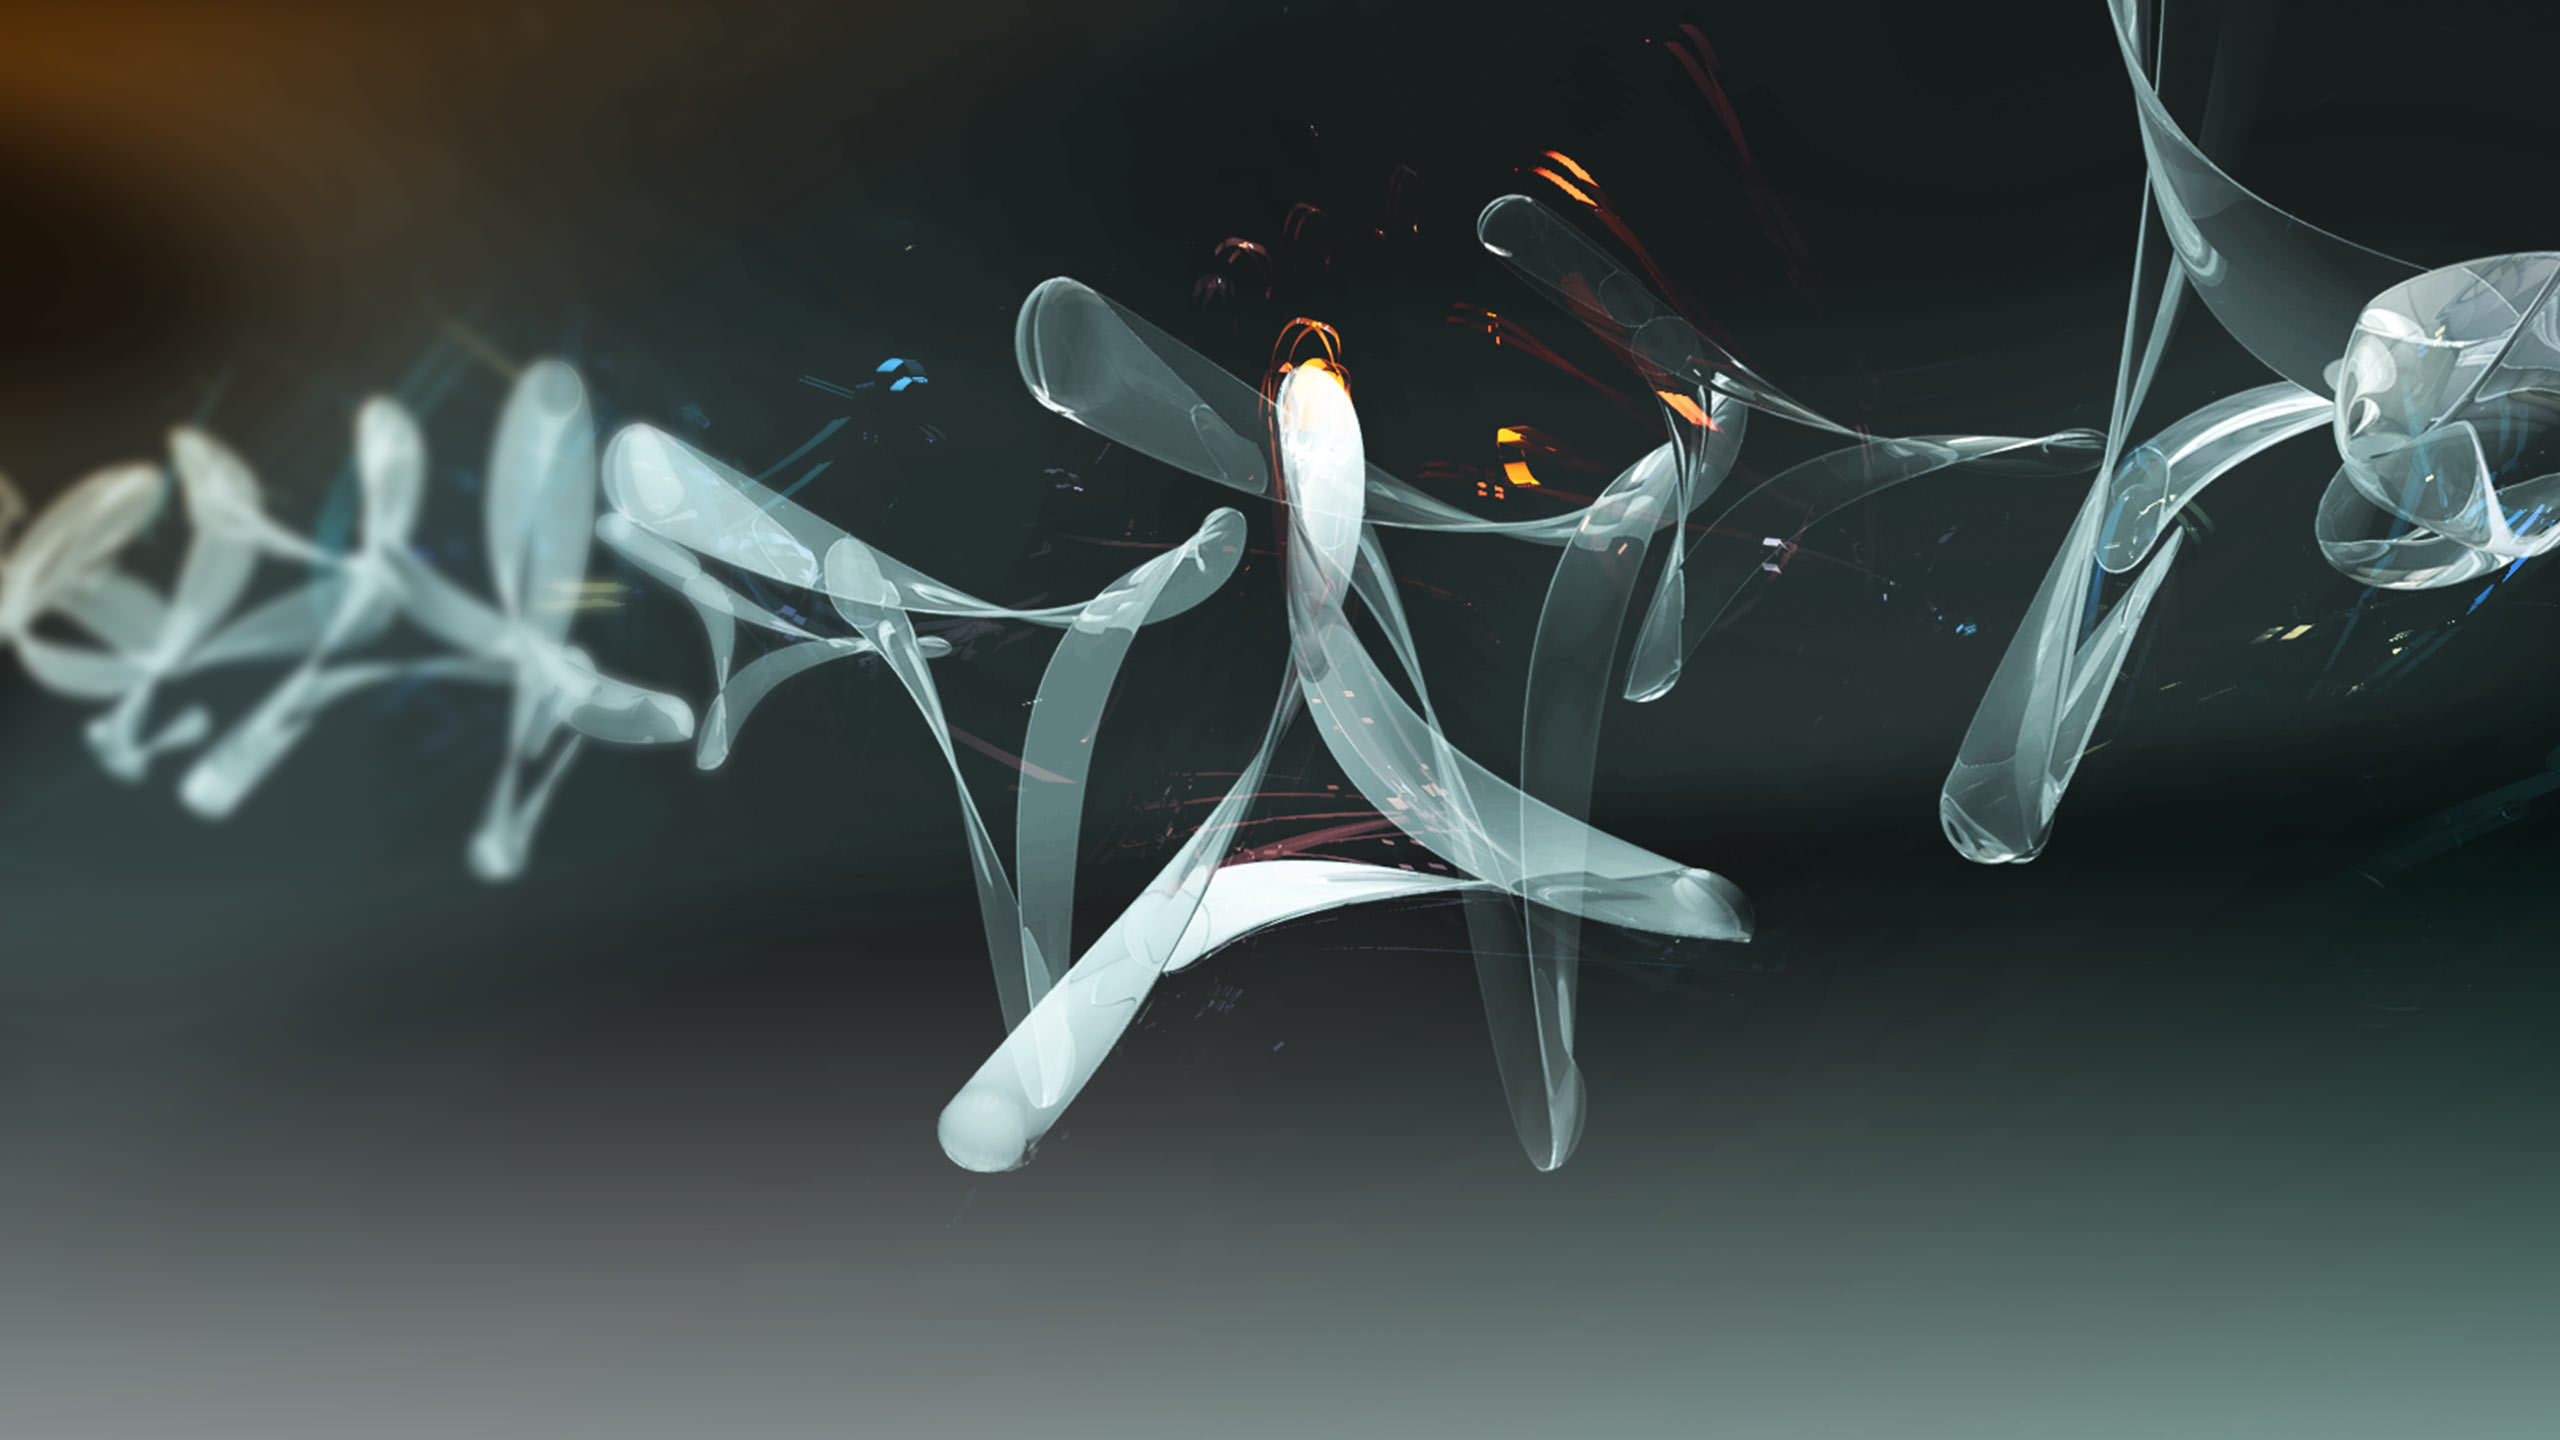 Adobe Acrobat 11 Identity exploration for animation